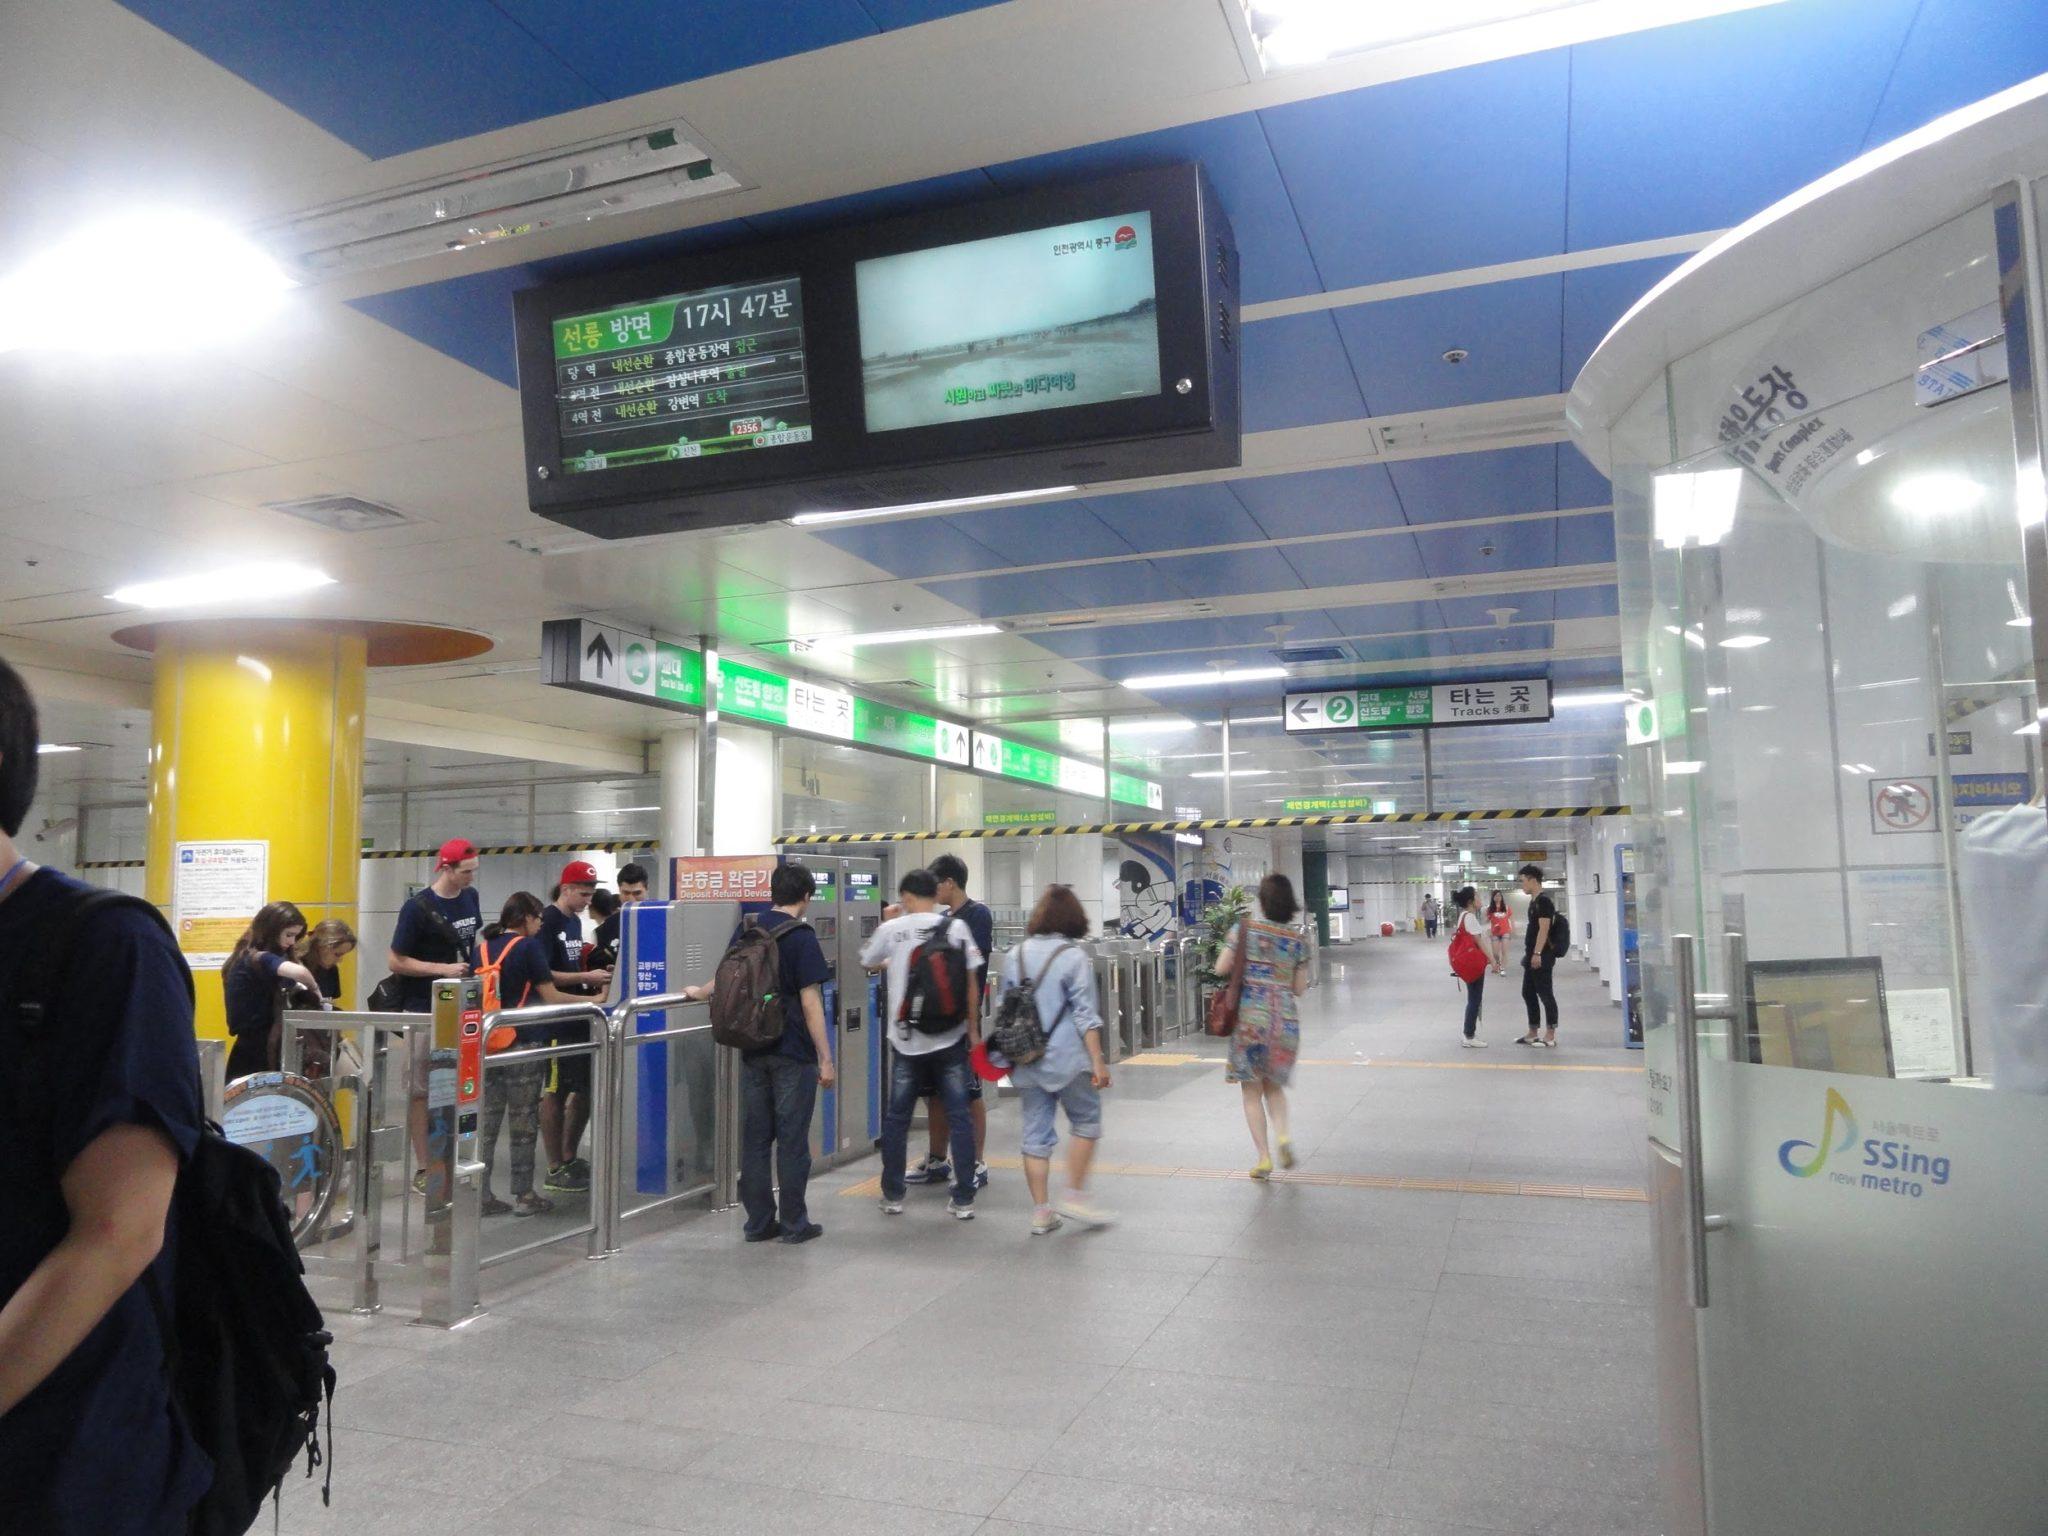 Metro, Seoul, South Korea